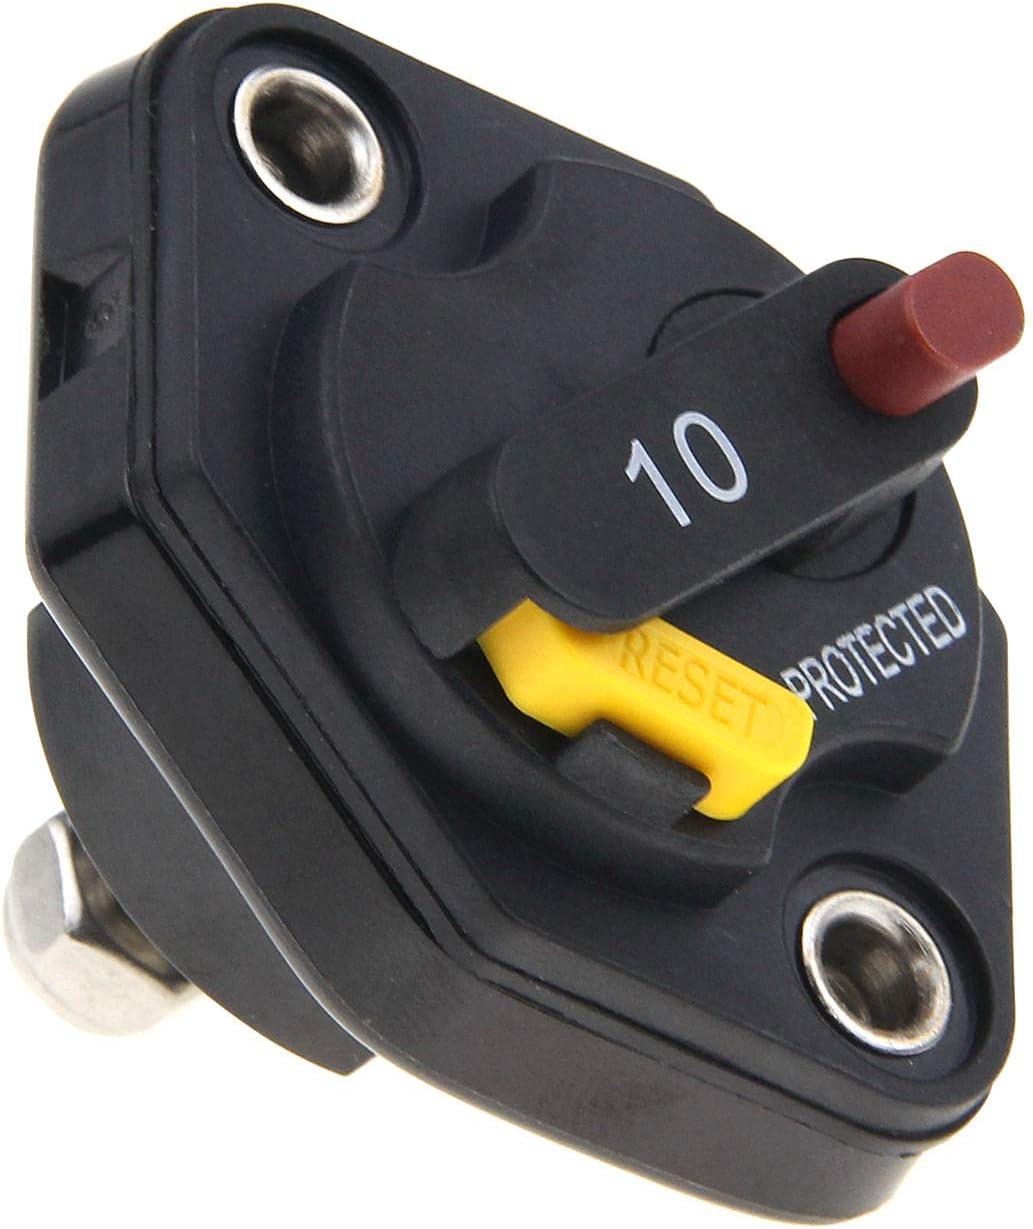 RKURCK 12V-32V DC Manual Reset Circuit Breaker Fuse Inverter 15A ...